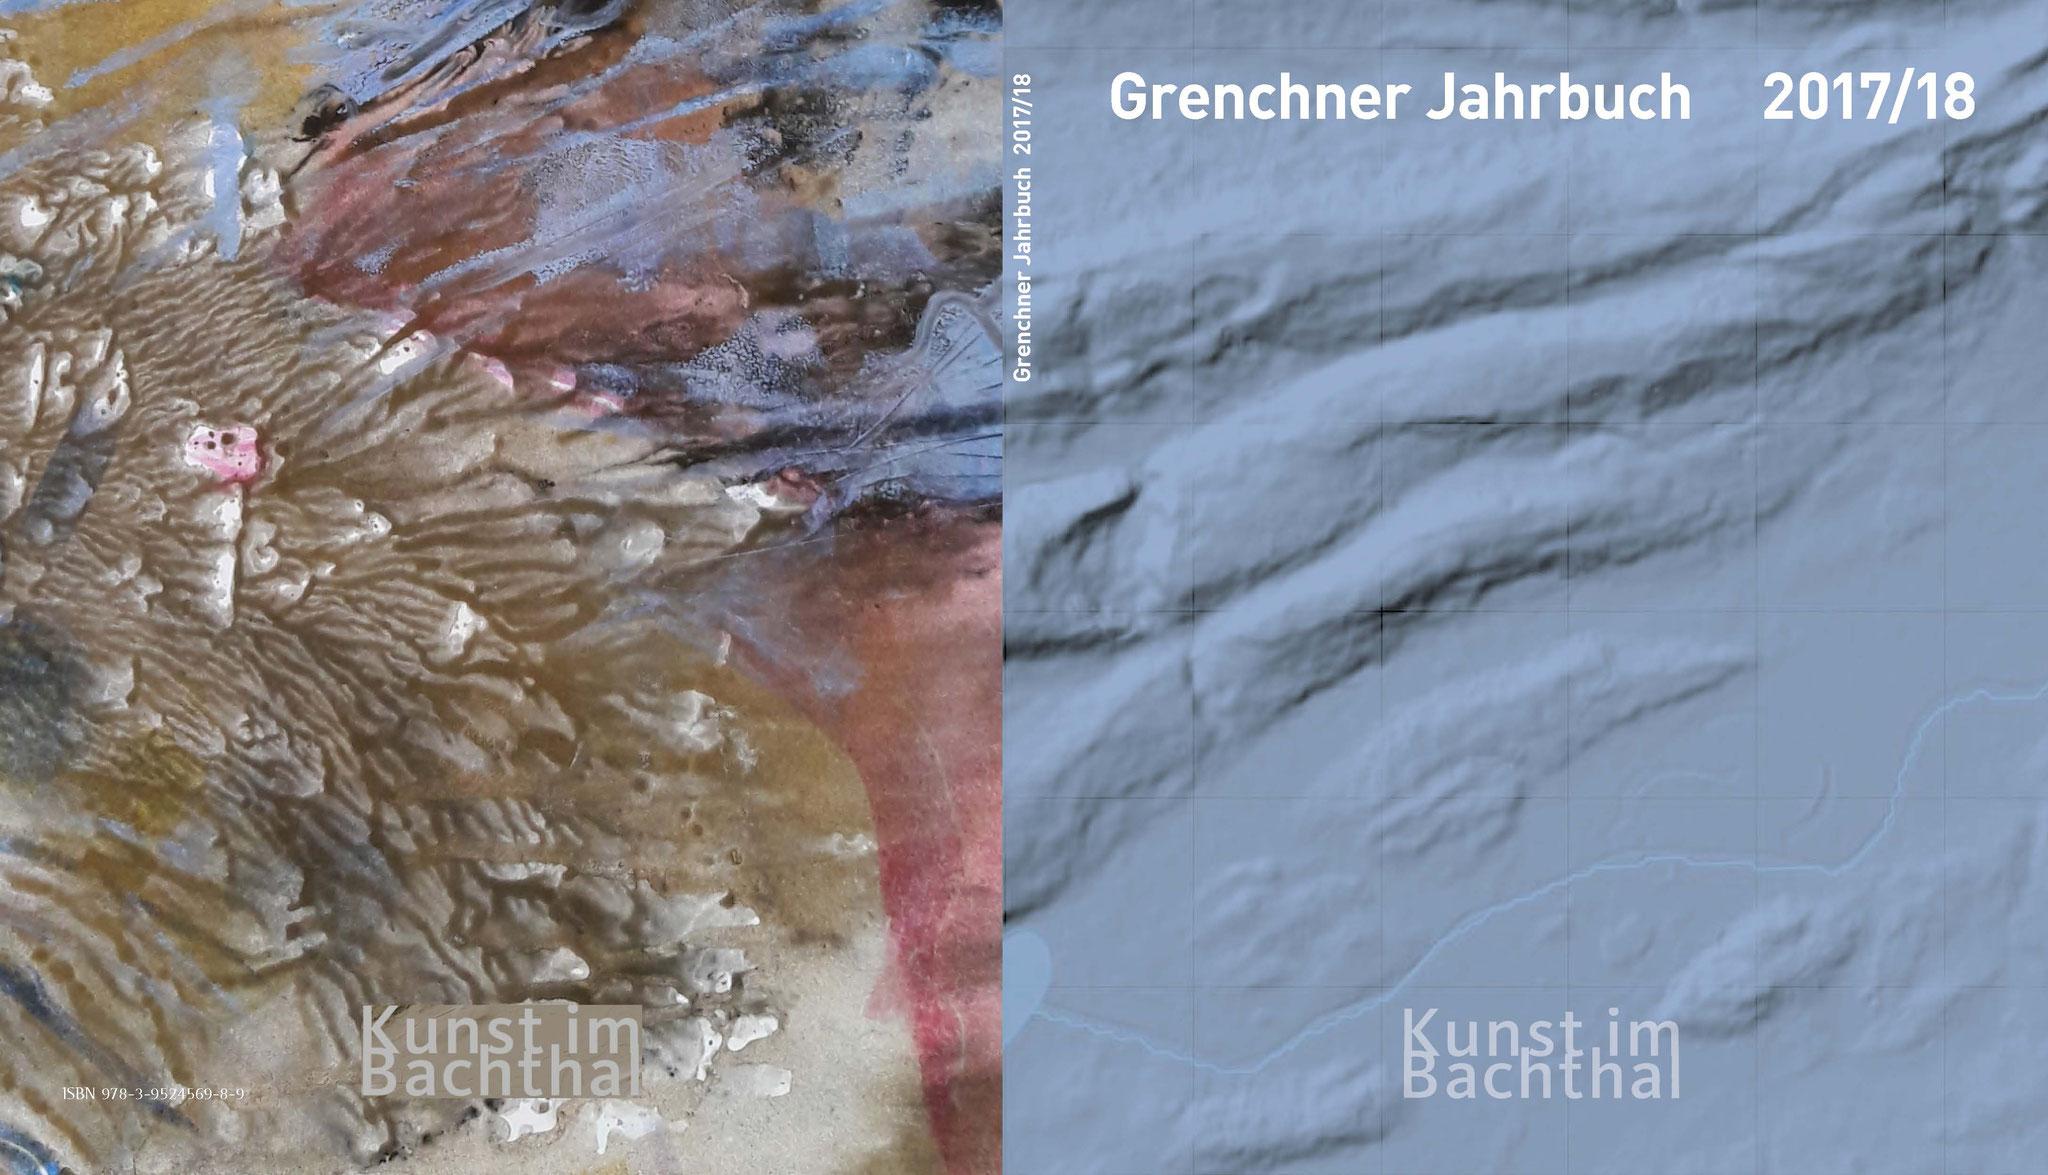 Grenchner Jahrbuch zum Bachthal